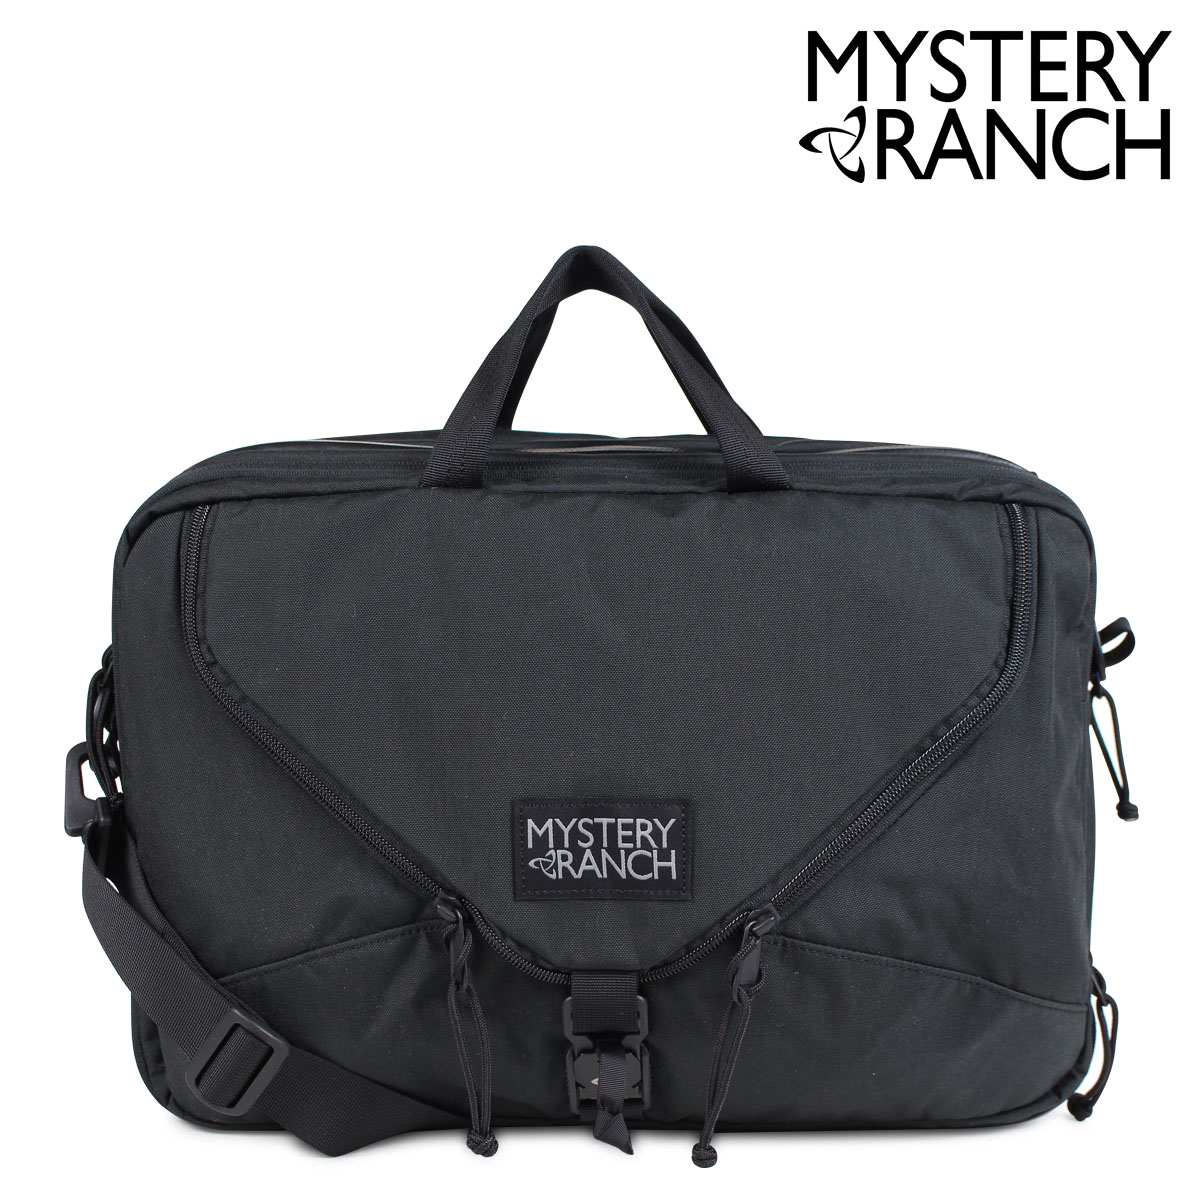 MYSTERY RANCH 3-WAY ミステリーランチ リュック ショルダー 3WAY ブリーフケース スリーウェイ 22L メンズ レディース ブラック 19761184